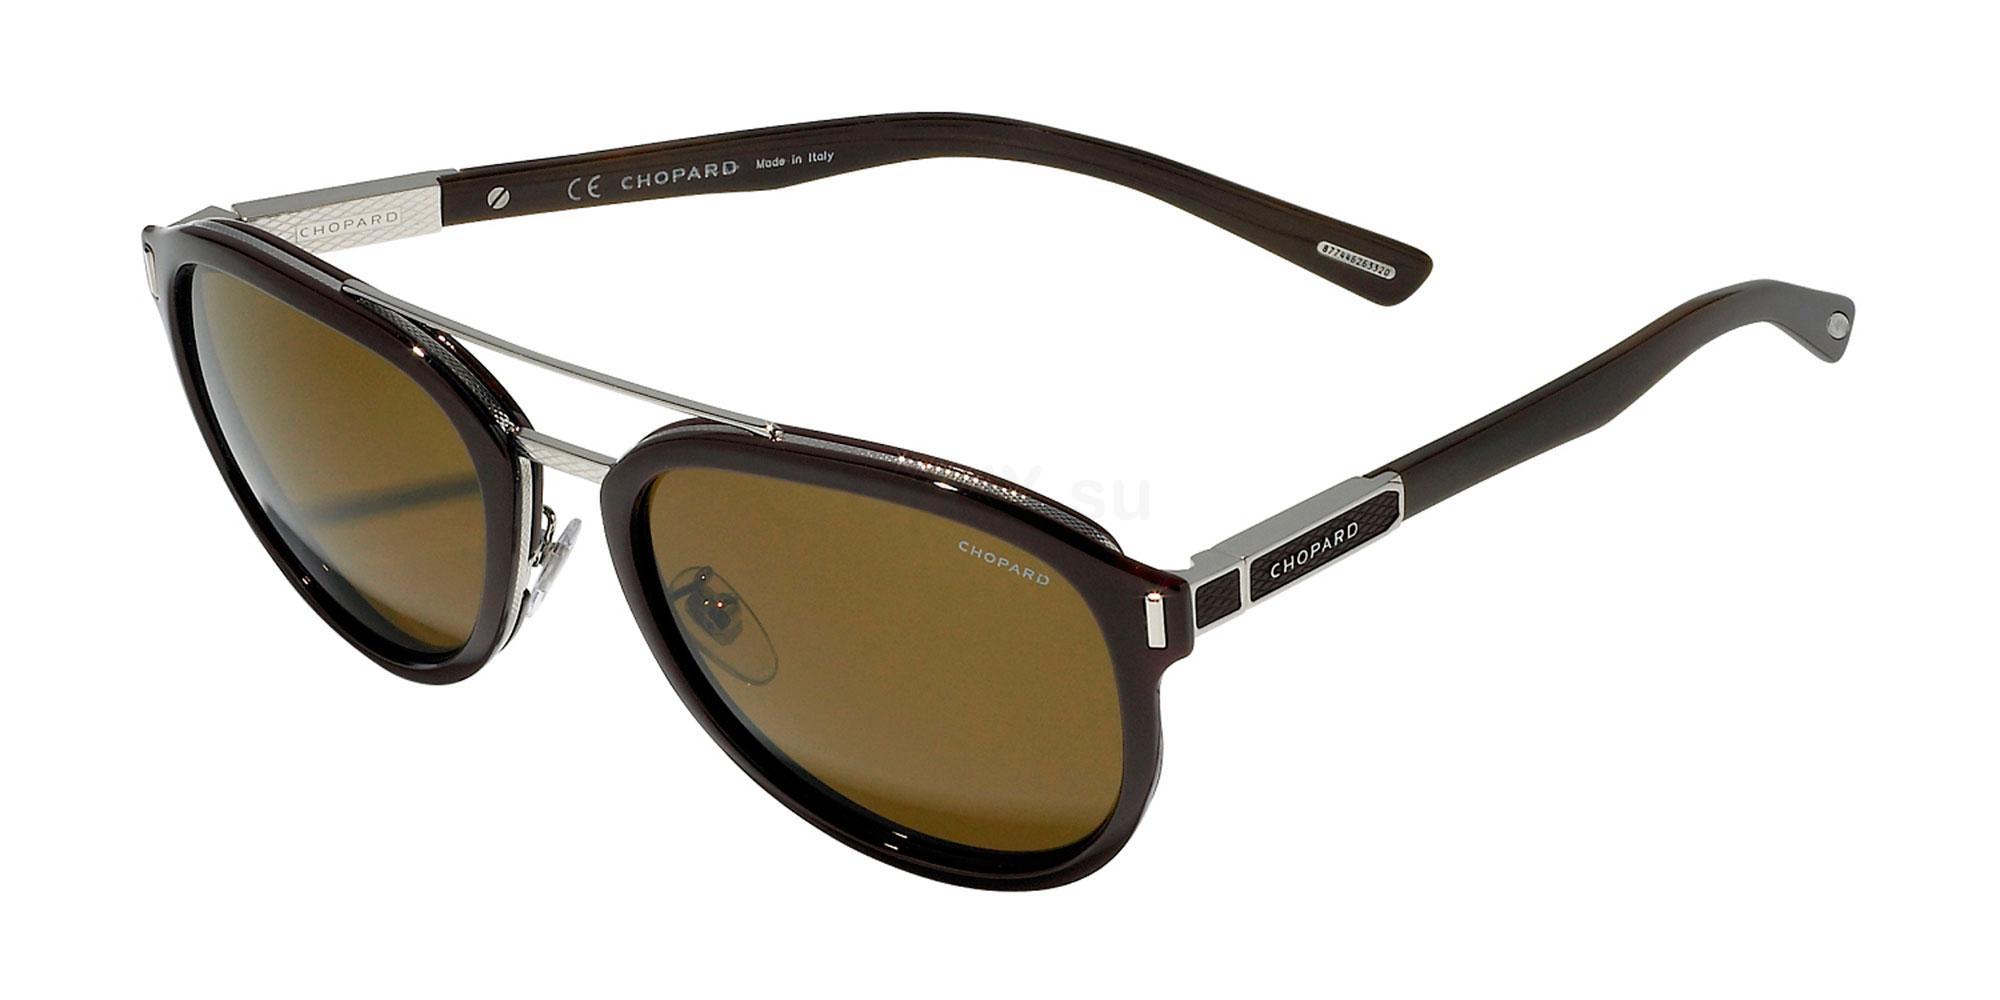 6XKZ SCHB85 Sunglasses, Chopard